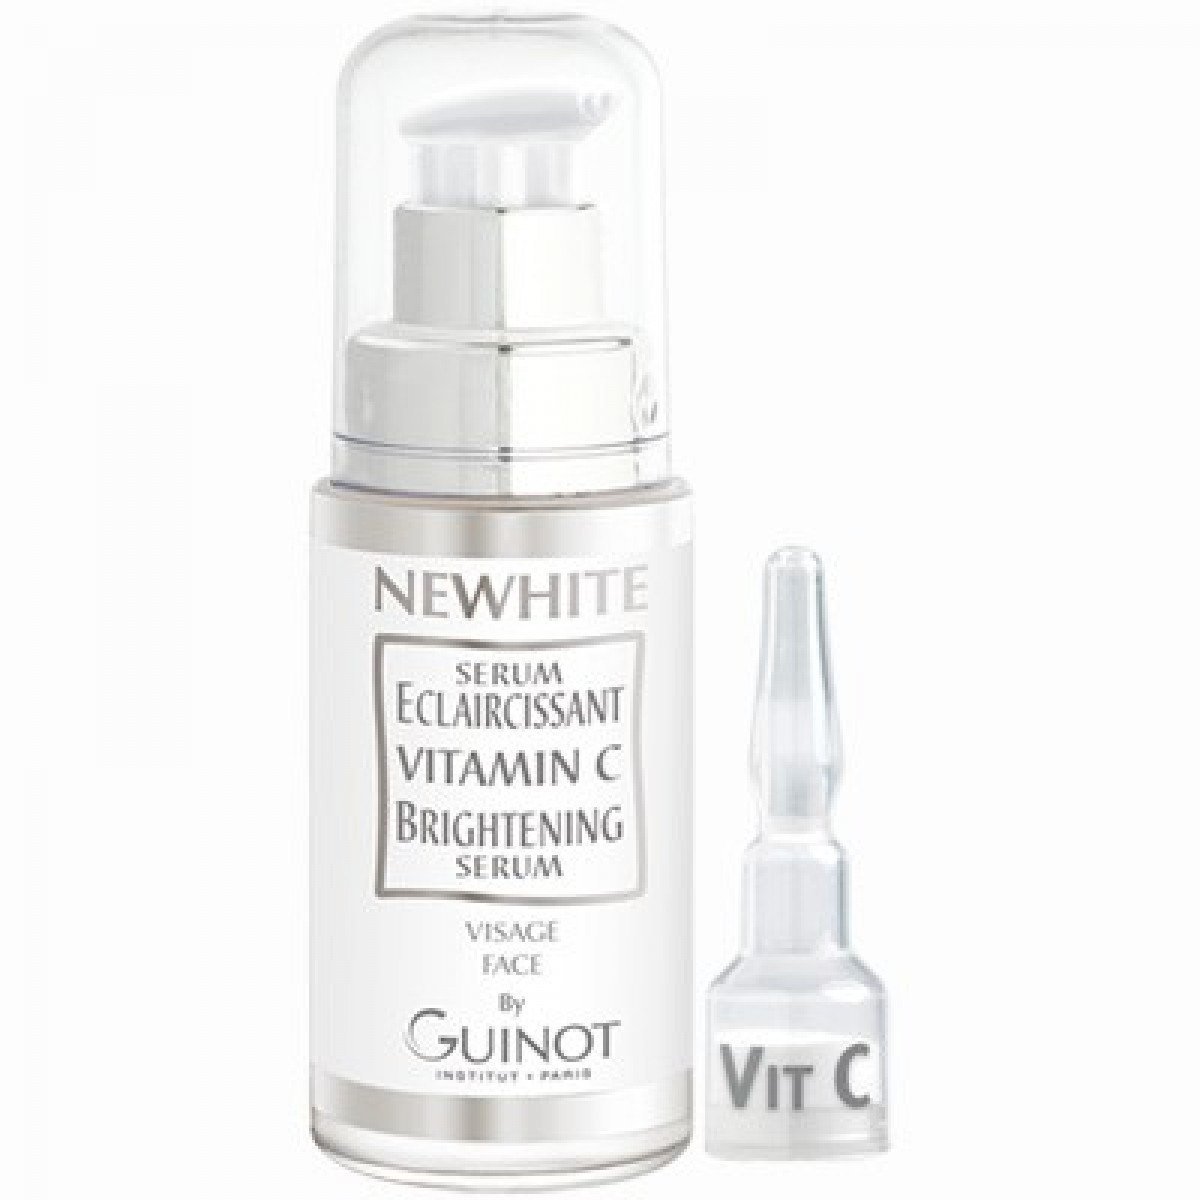 Serum Eclaircissant Vitamin C /Осветляющий серум с Витамином С